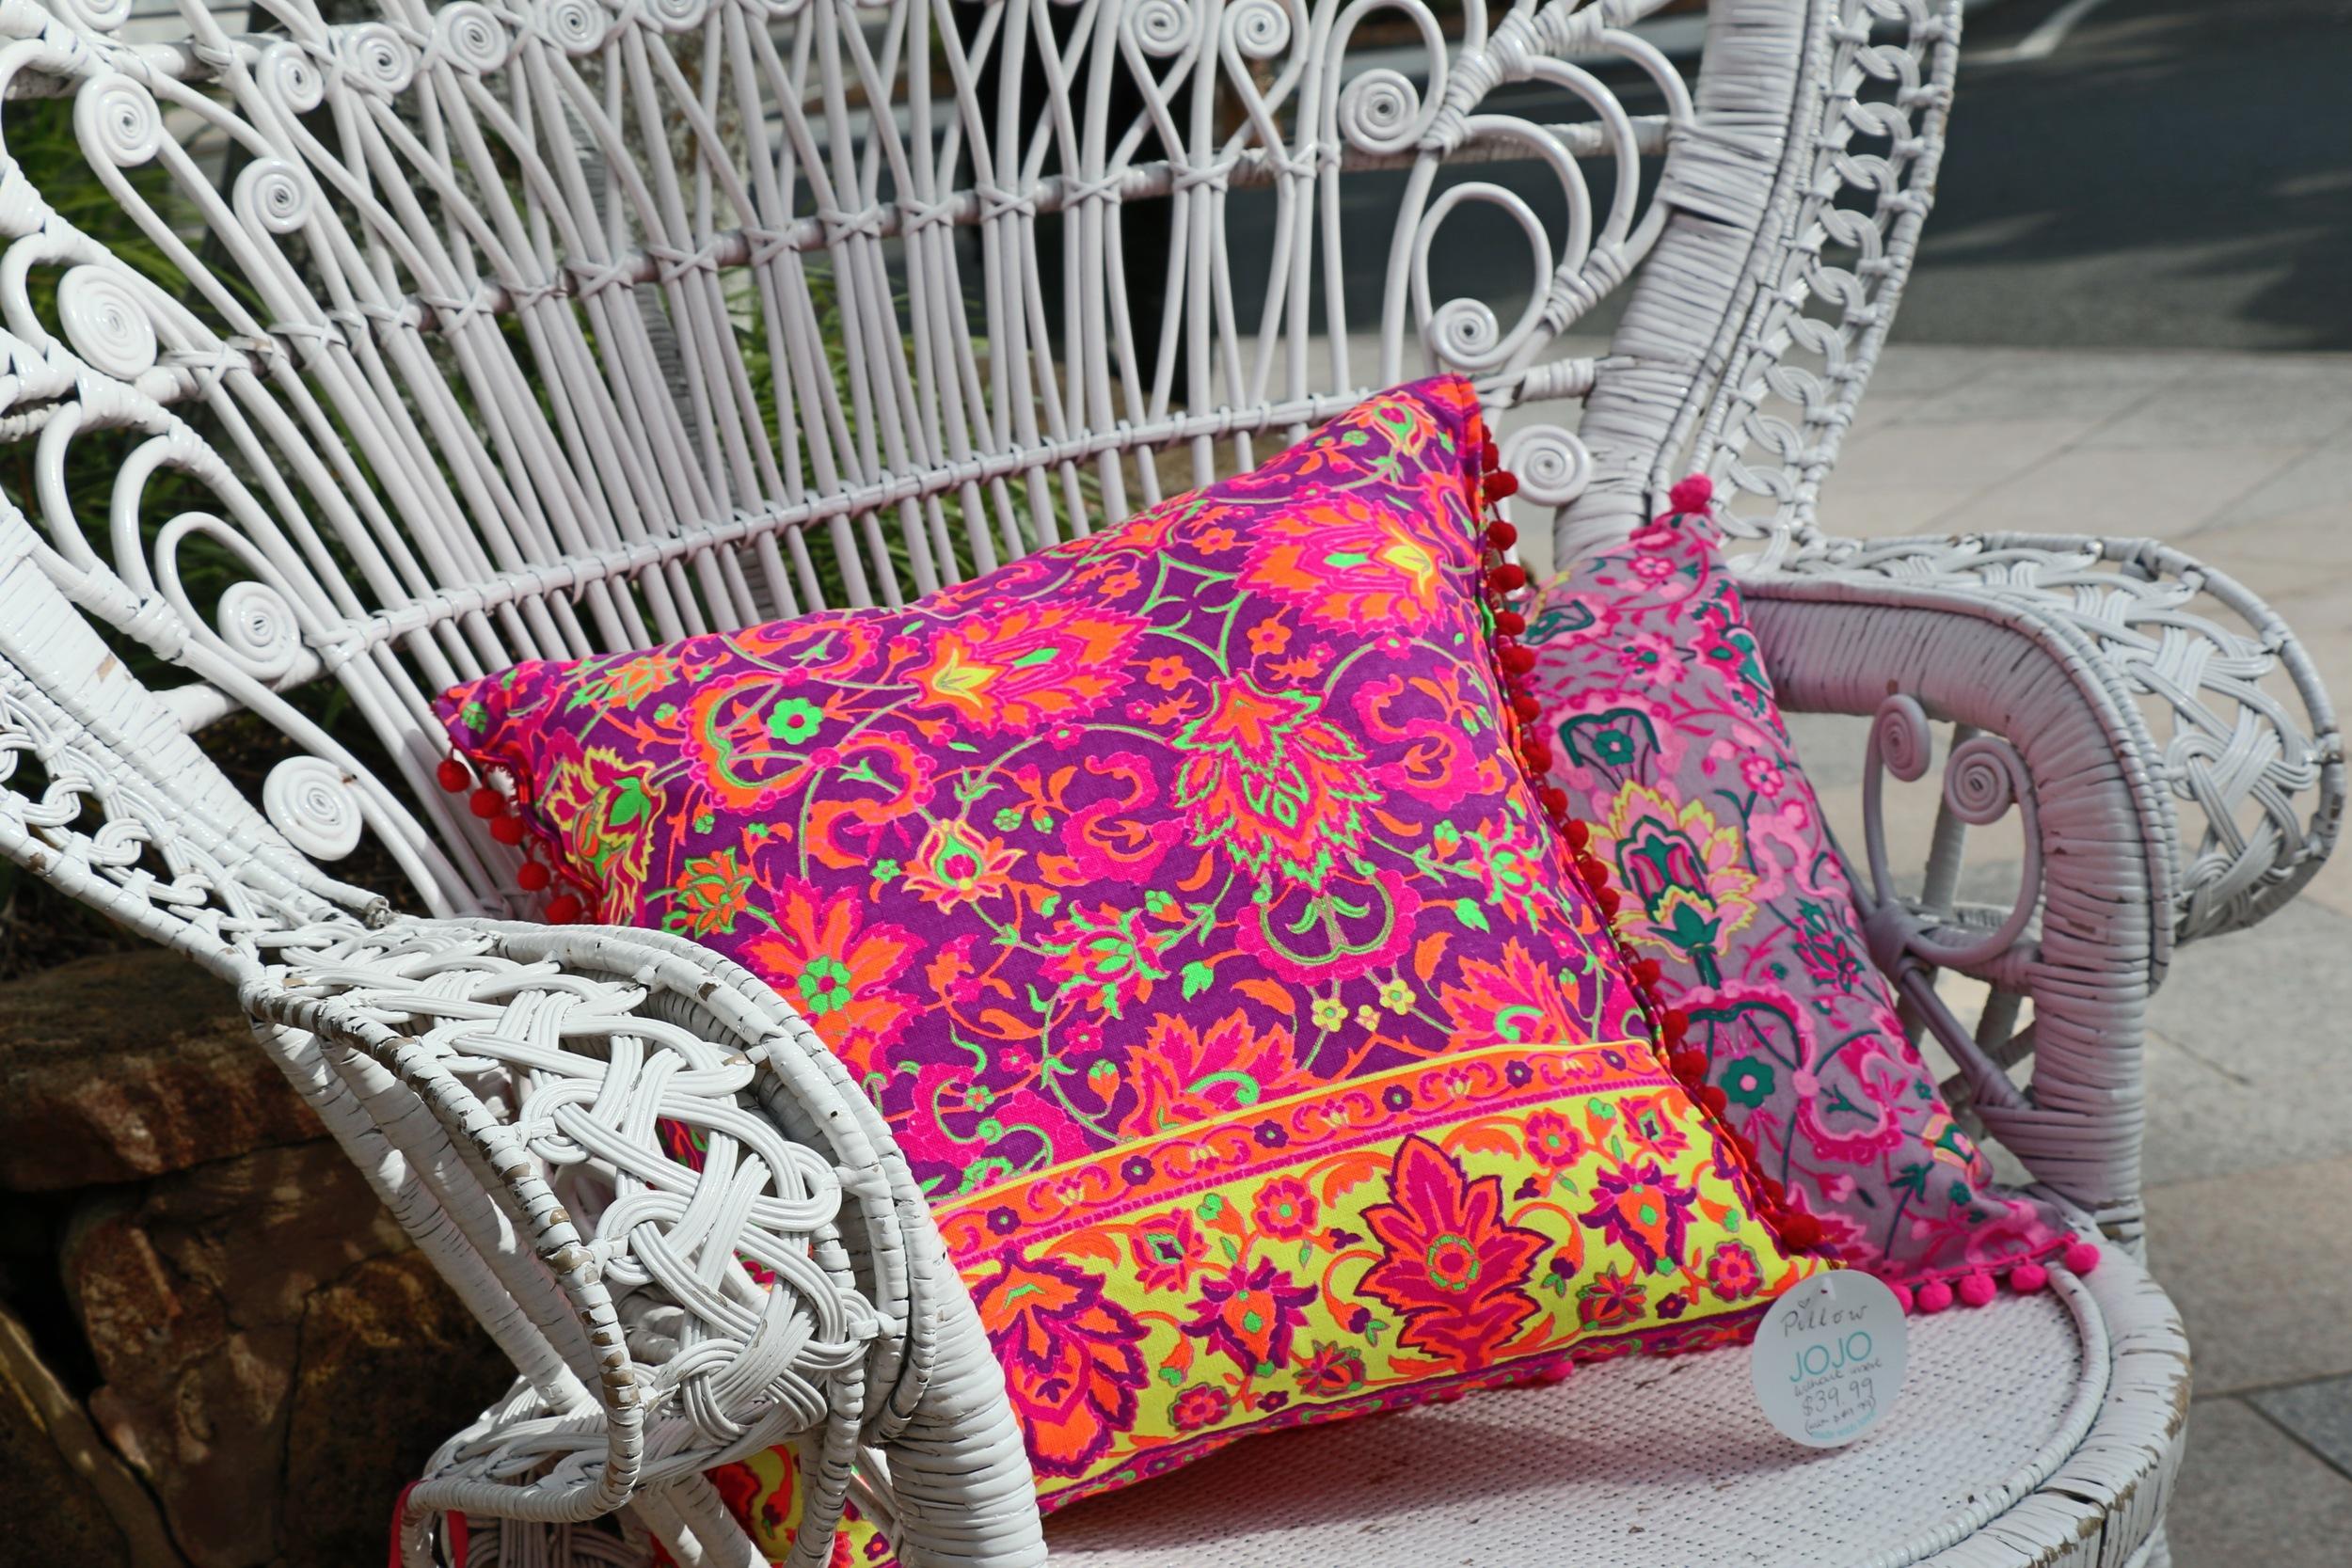 Wicker Chair With Cushions.jpg